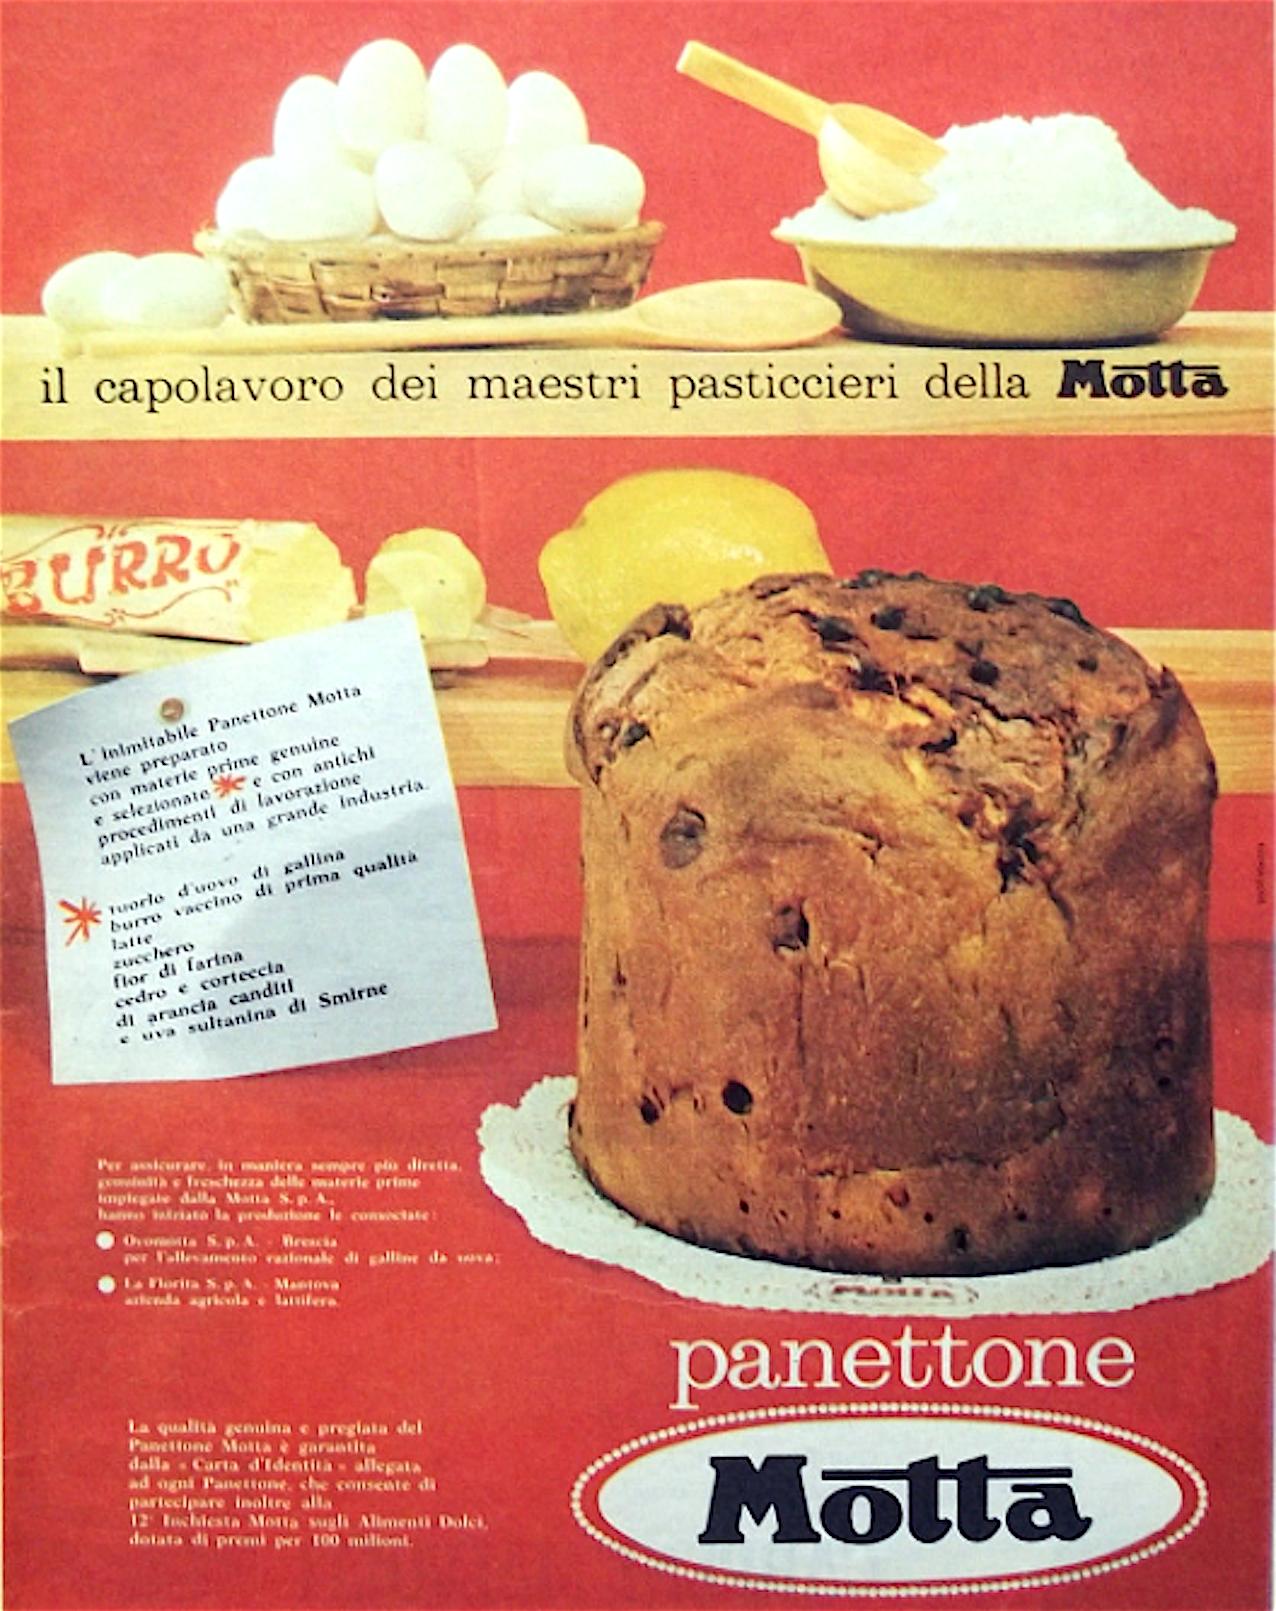 panettone_motta_vintage